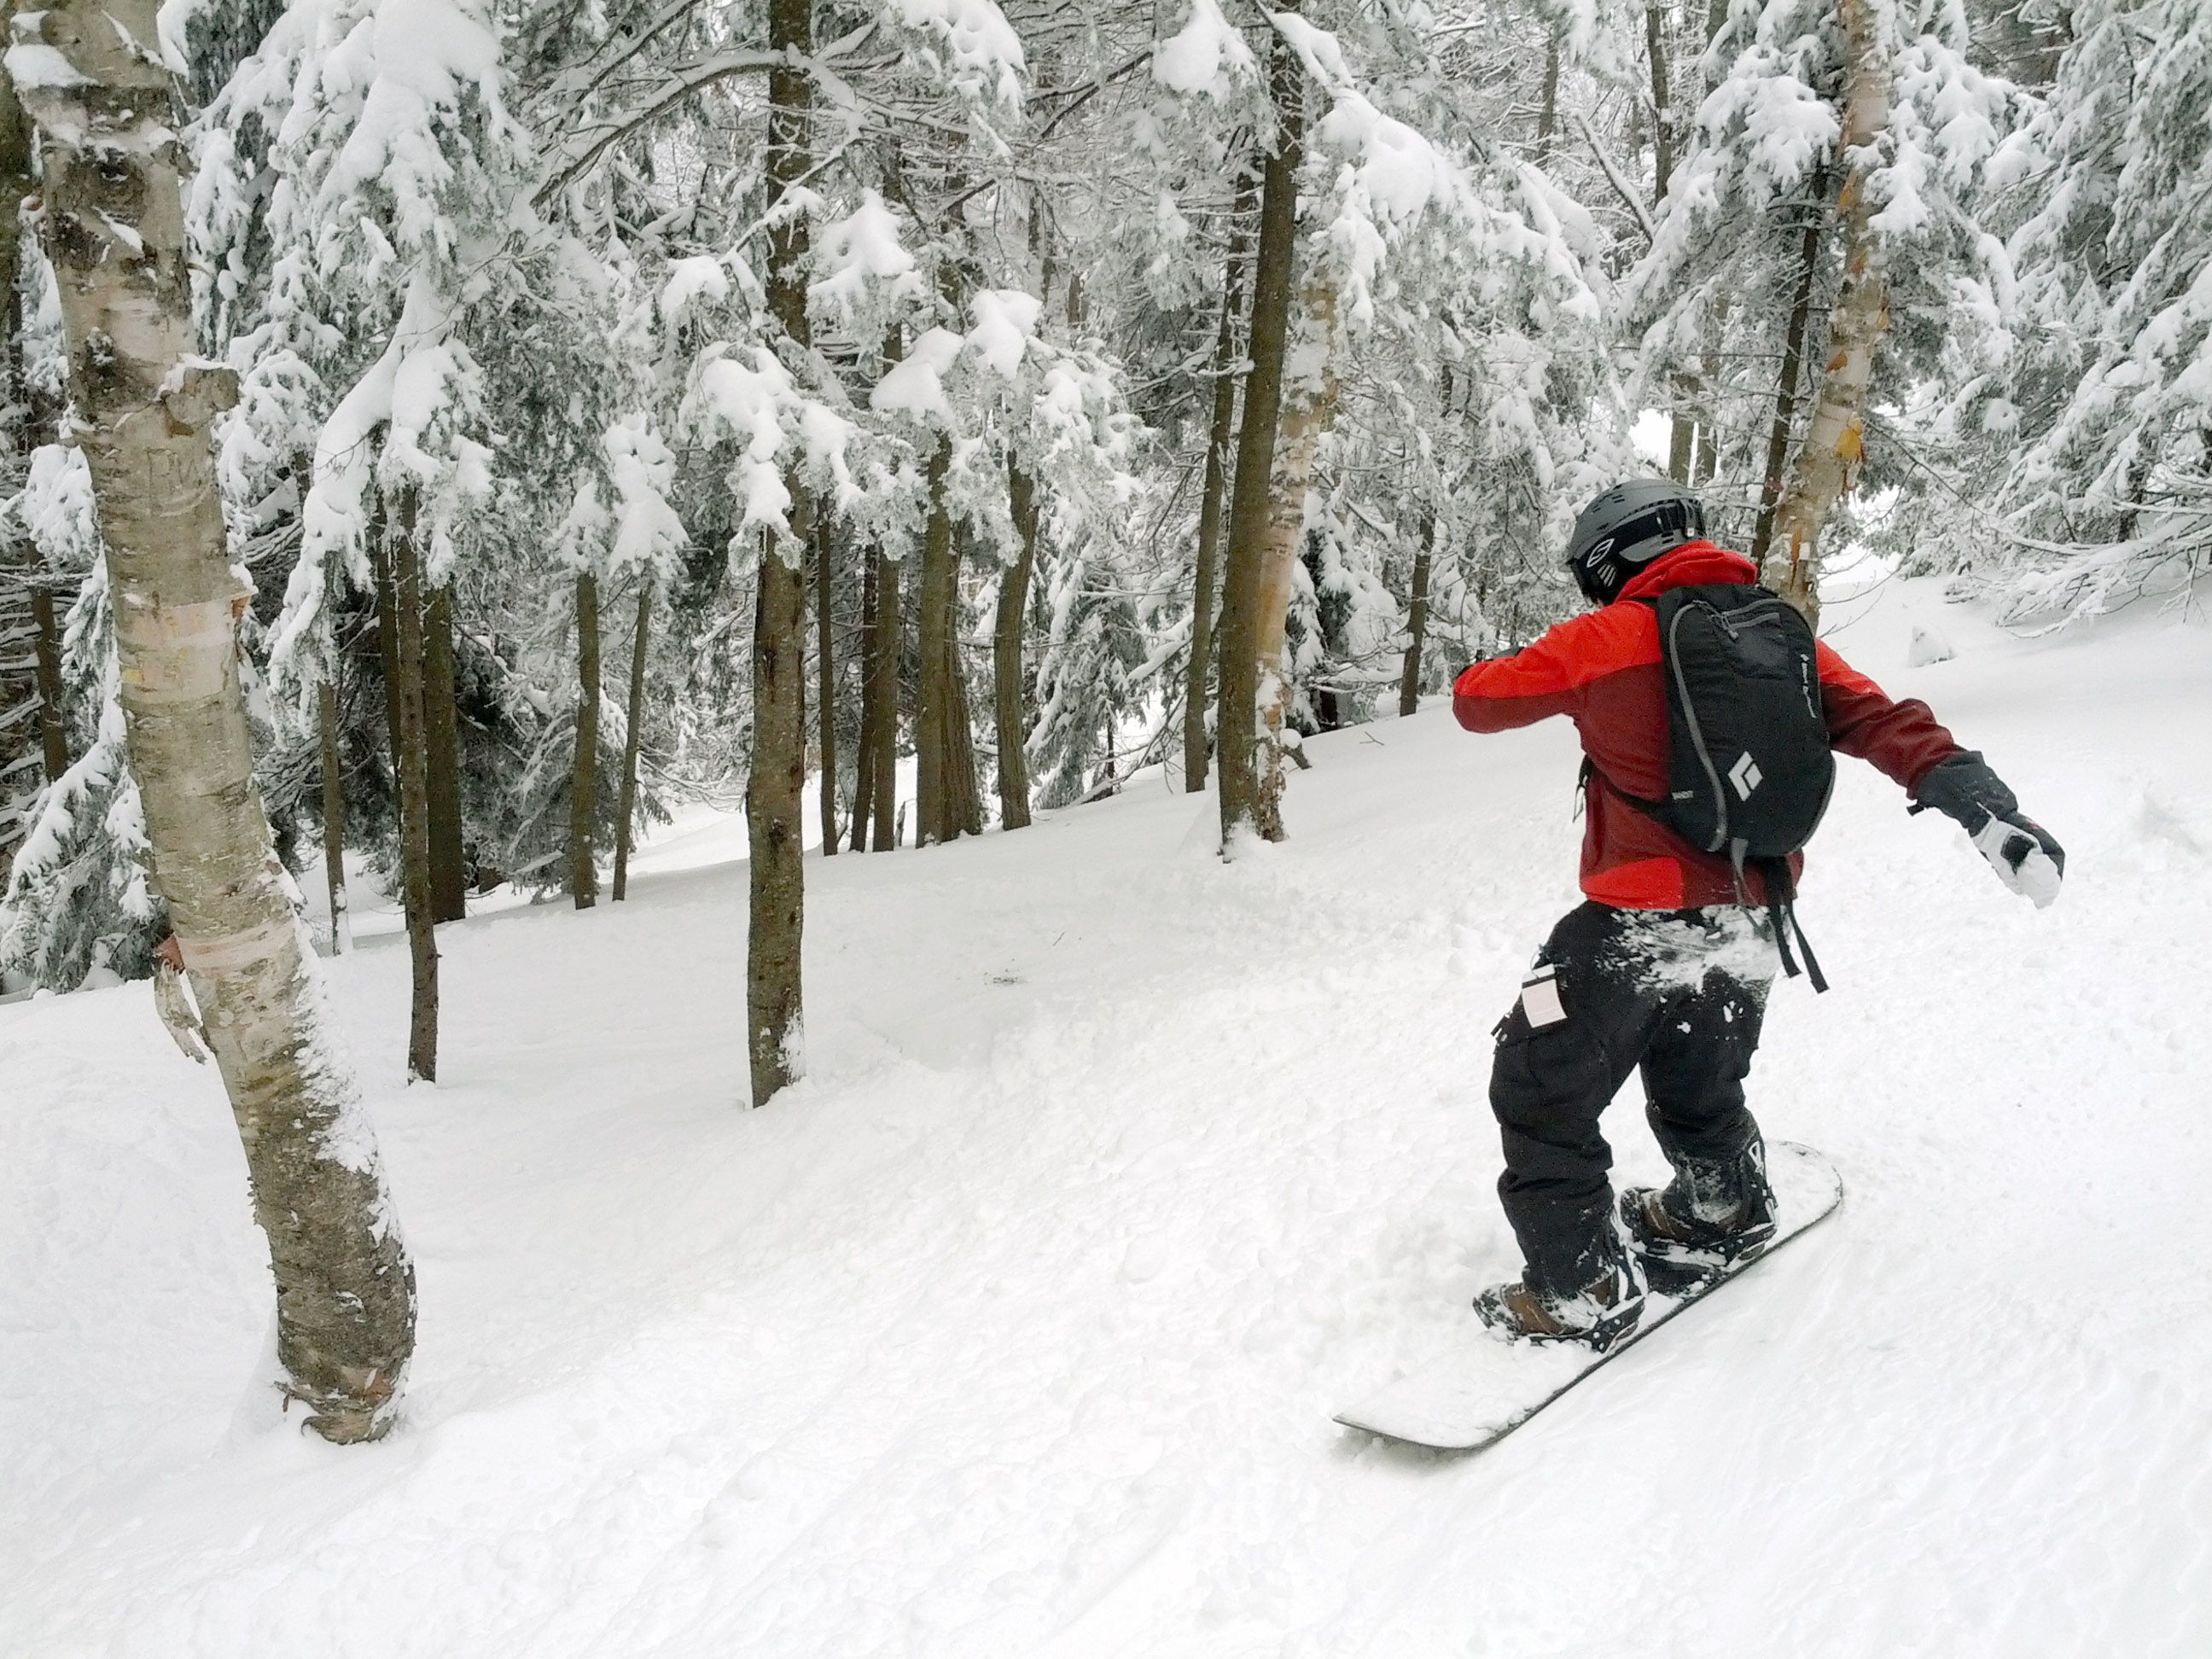 taking on a double black diamond at okemo ski resort: bumps and